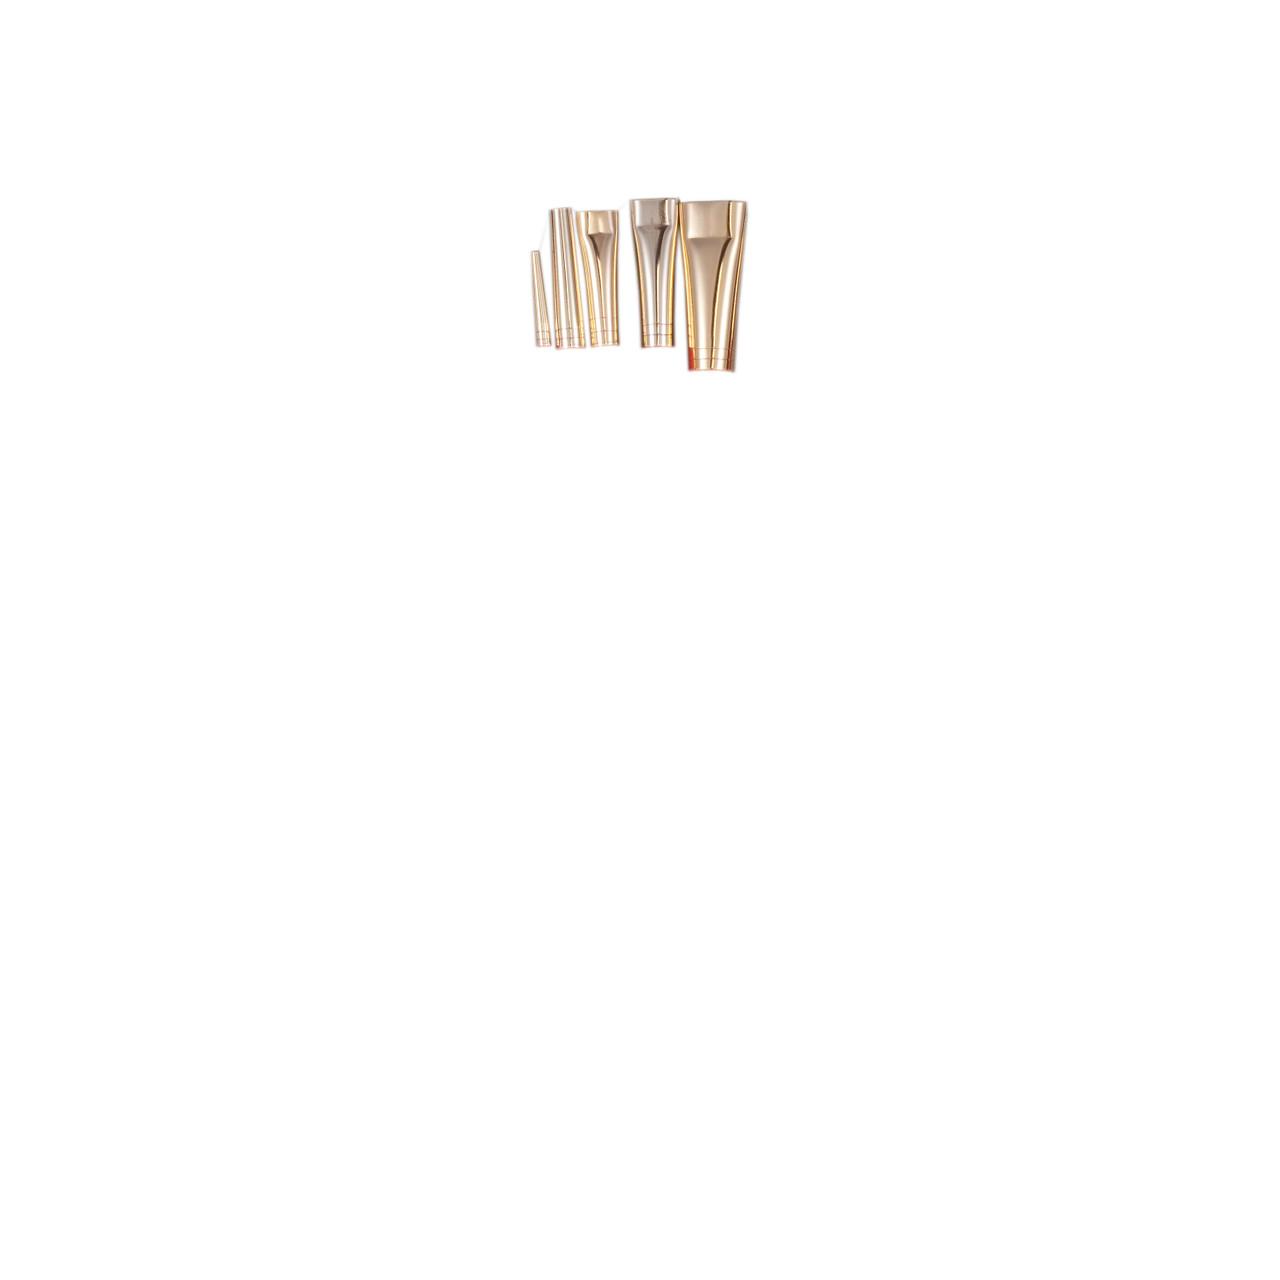 Synthetic White Taklon 5-Brush Set Round 1, 6, Bright 6, Filbert 8, Flat 12